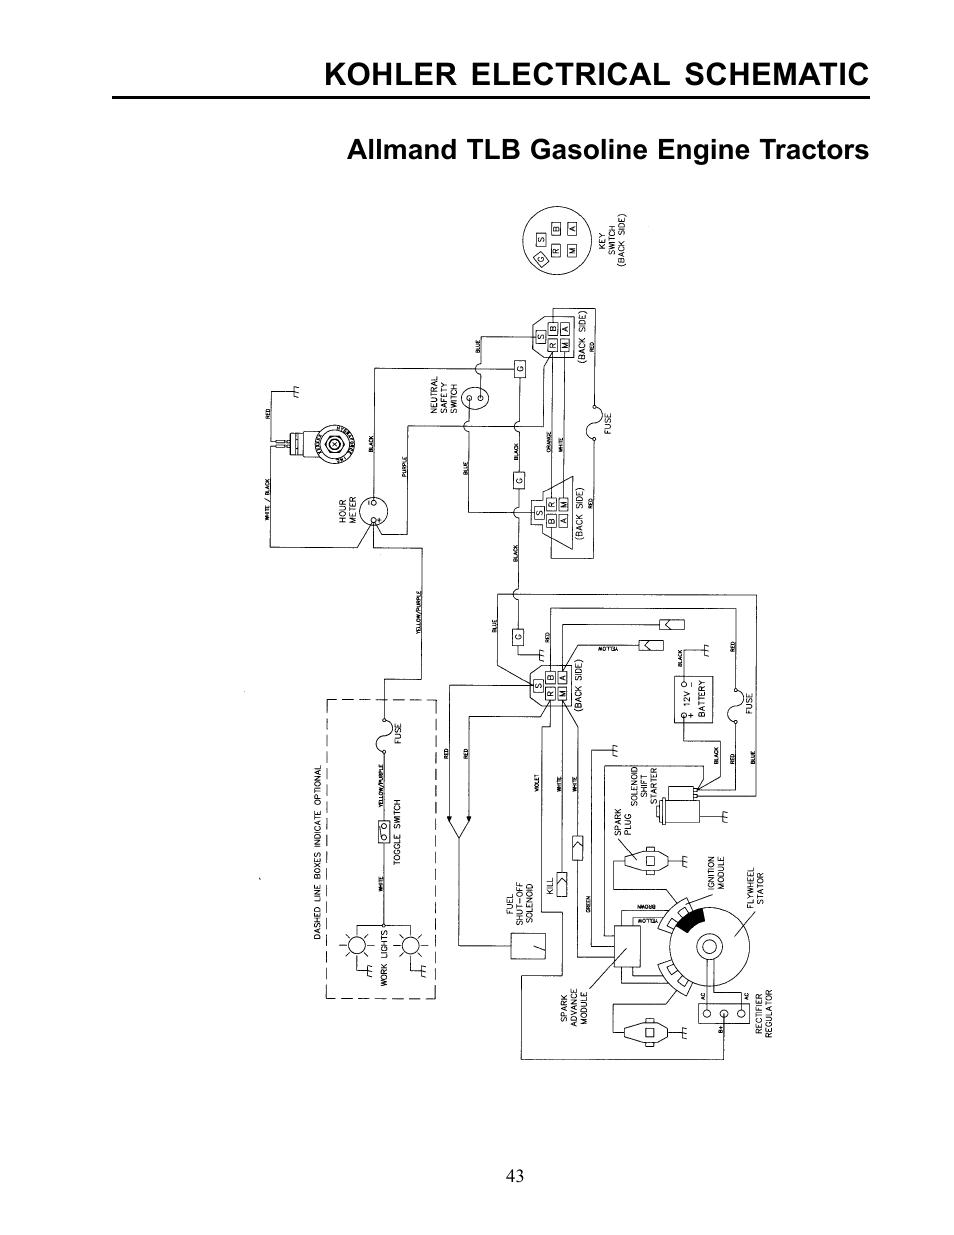 kohler electrical schematic